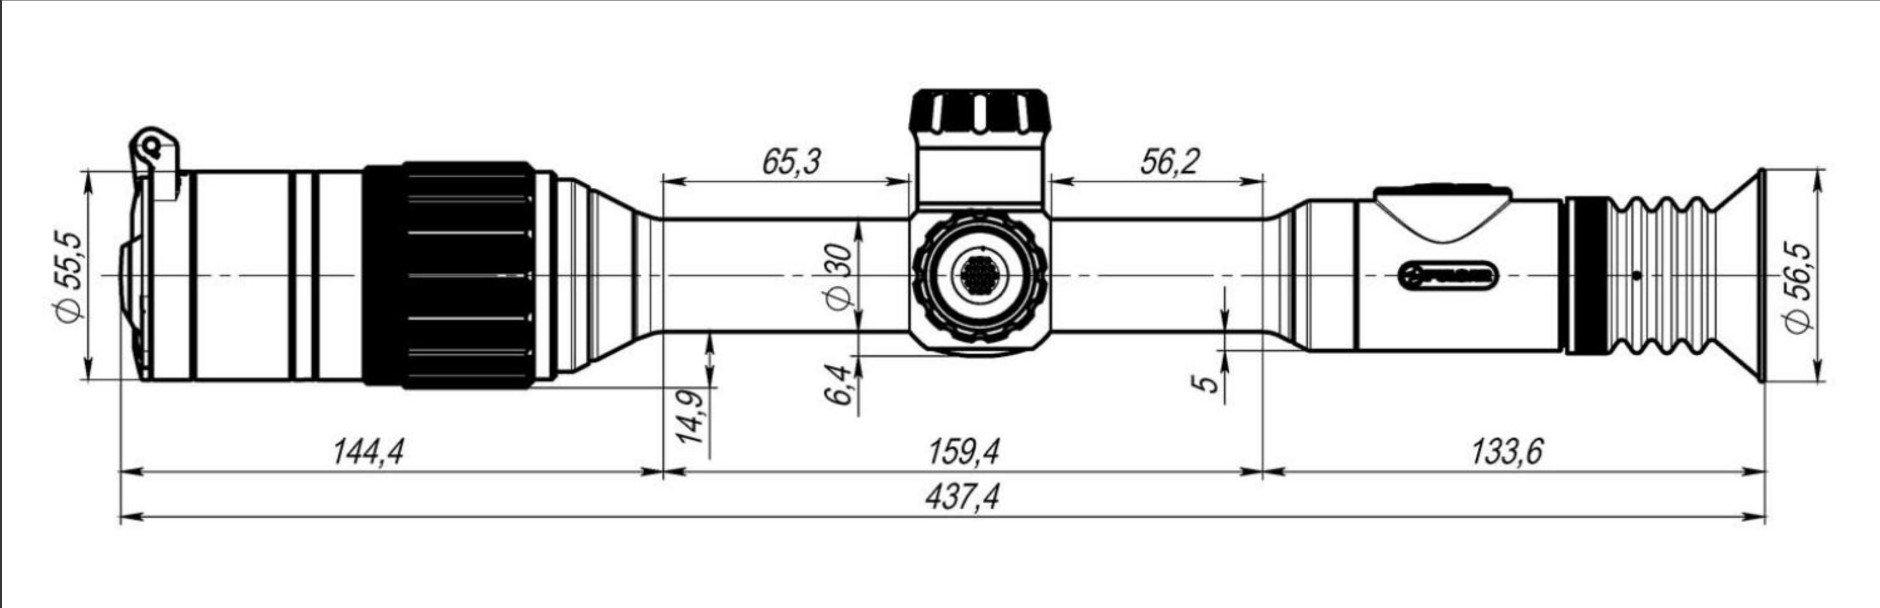 Pulsar Digex N450 4-16x50 Digital Night Vision Rifle Scope - Australian Tactical Precision